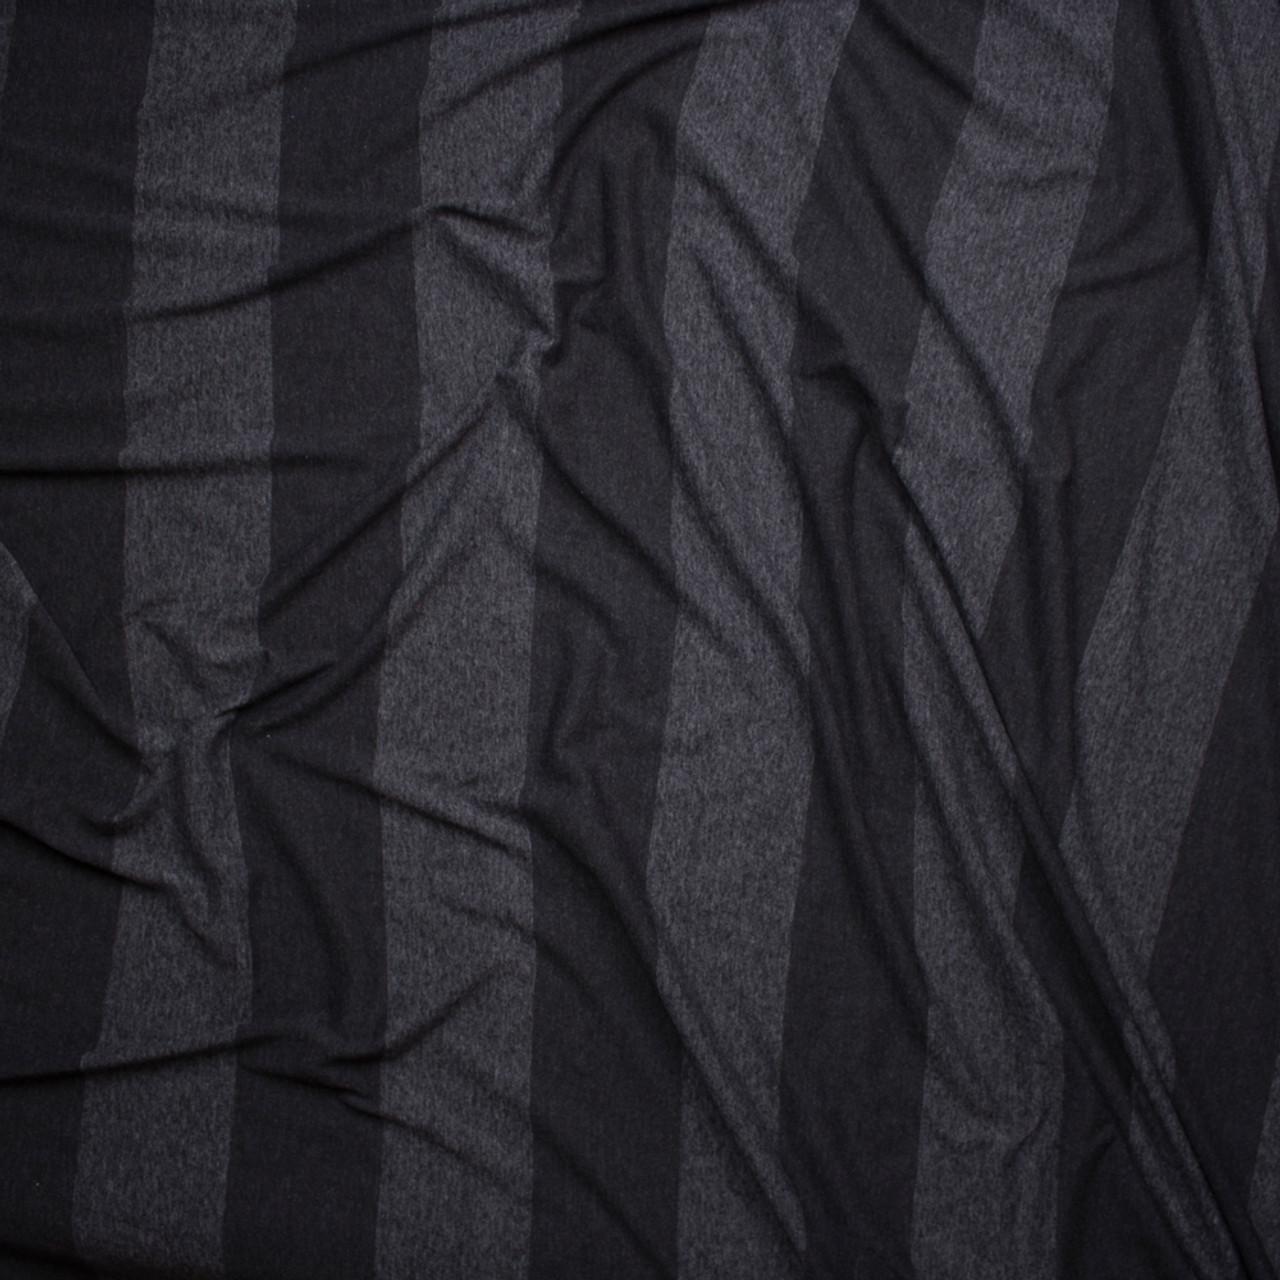 d8da814015f ... Black Wide Stripe Lightweight Jersey Knit Fabric By The Yard - Wide shot